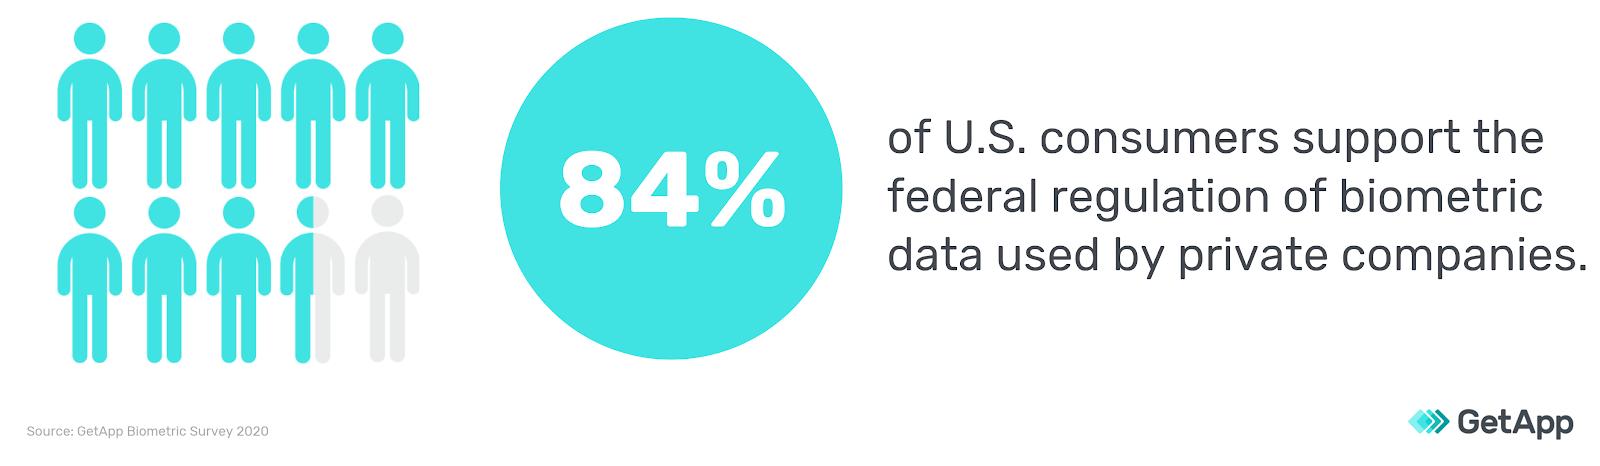 federal regulation of biometric data survey